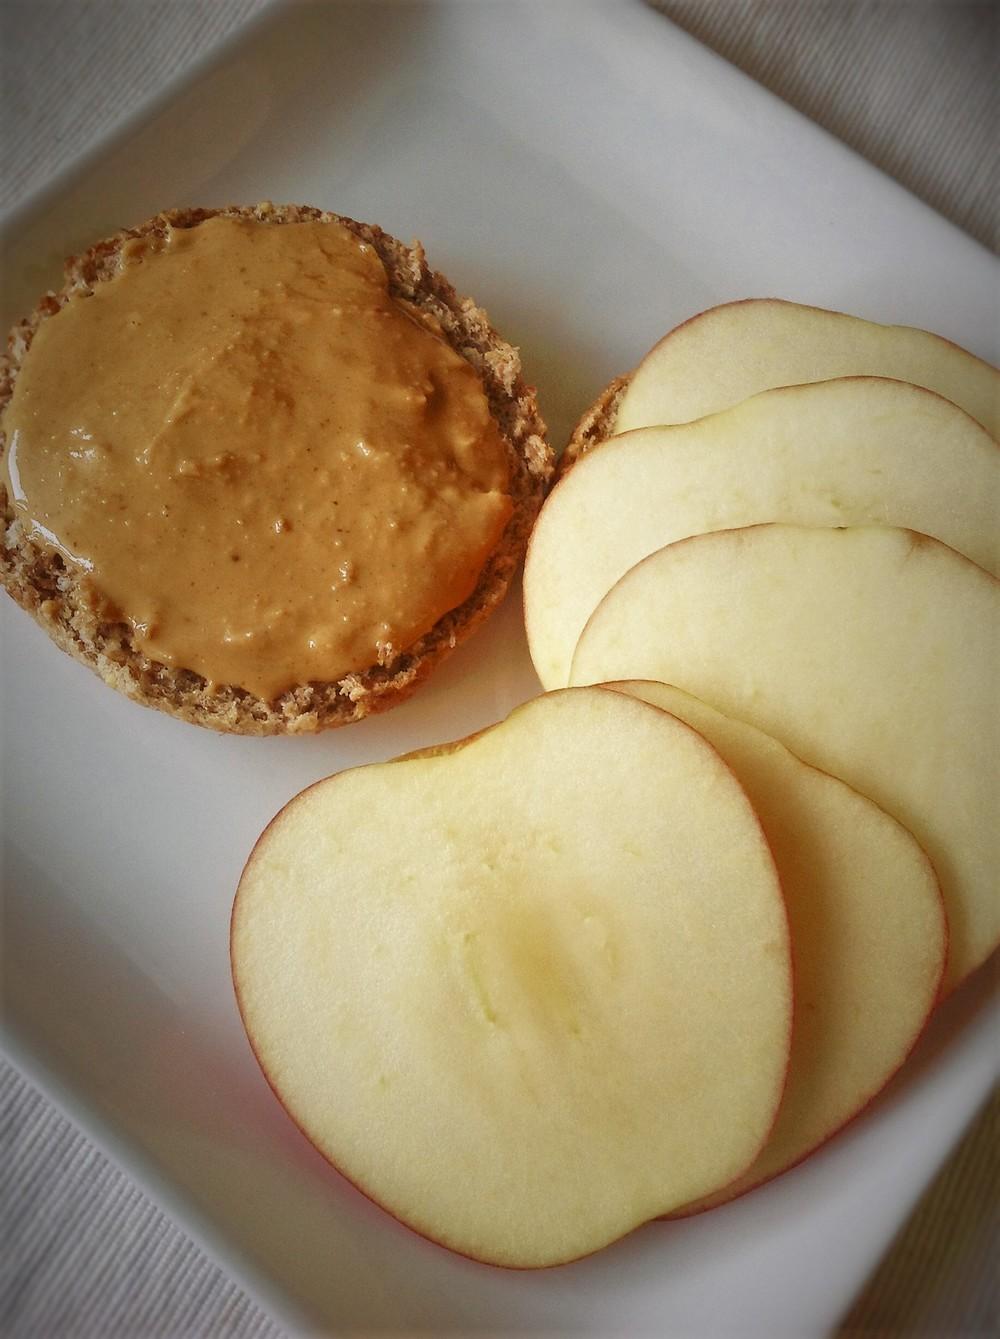 Peanut Butter Apple English Muffin.jpg